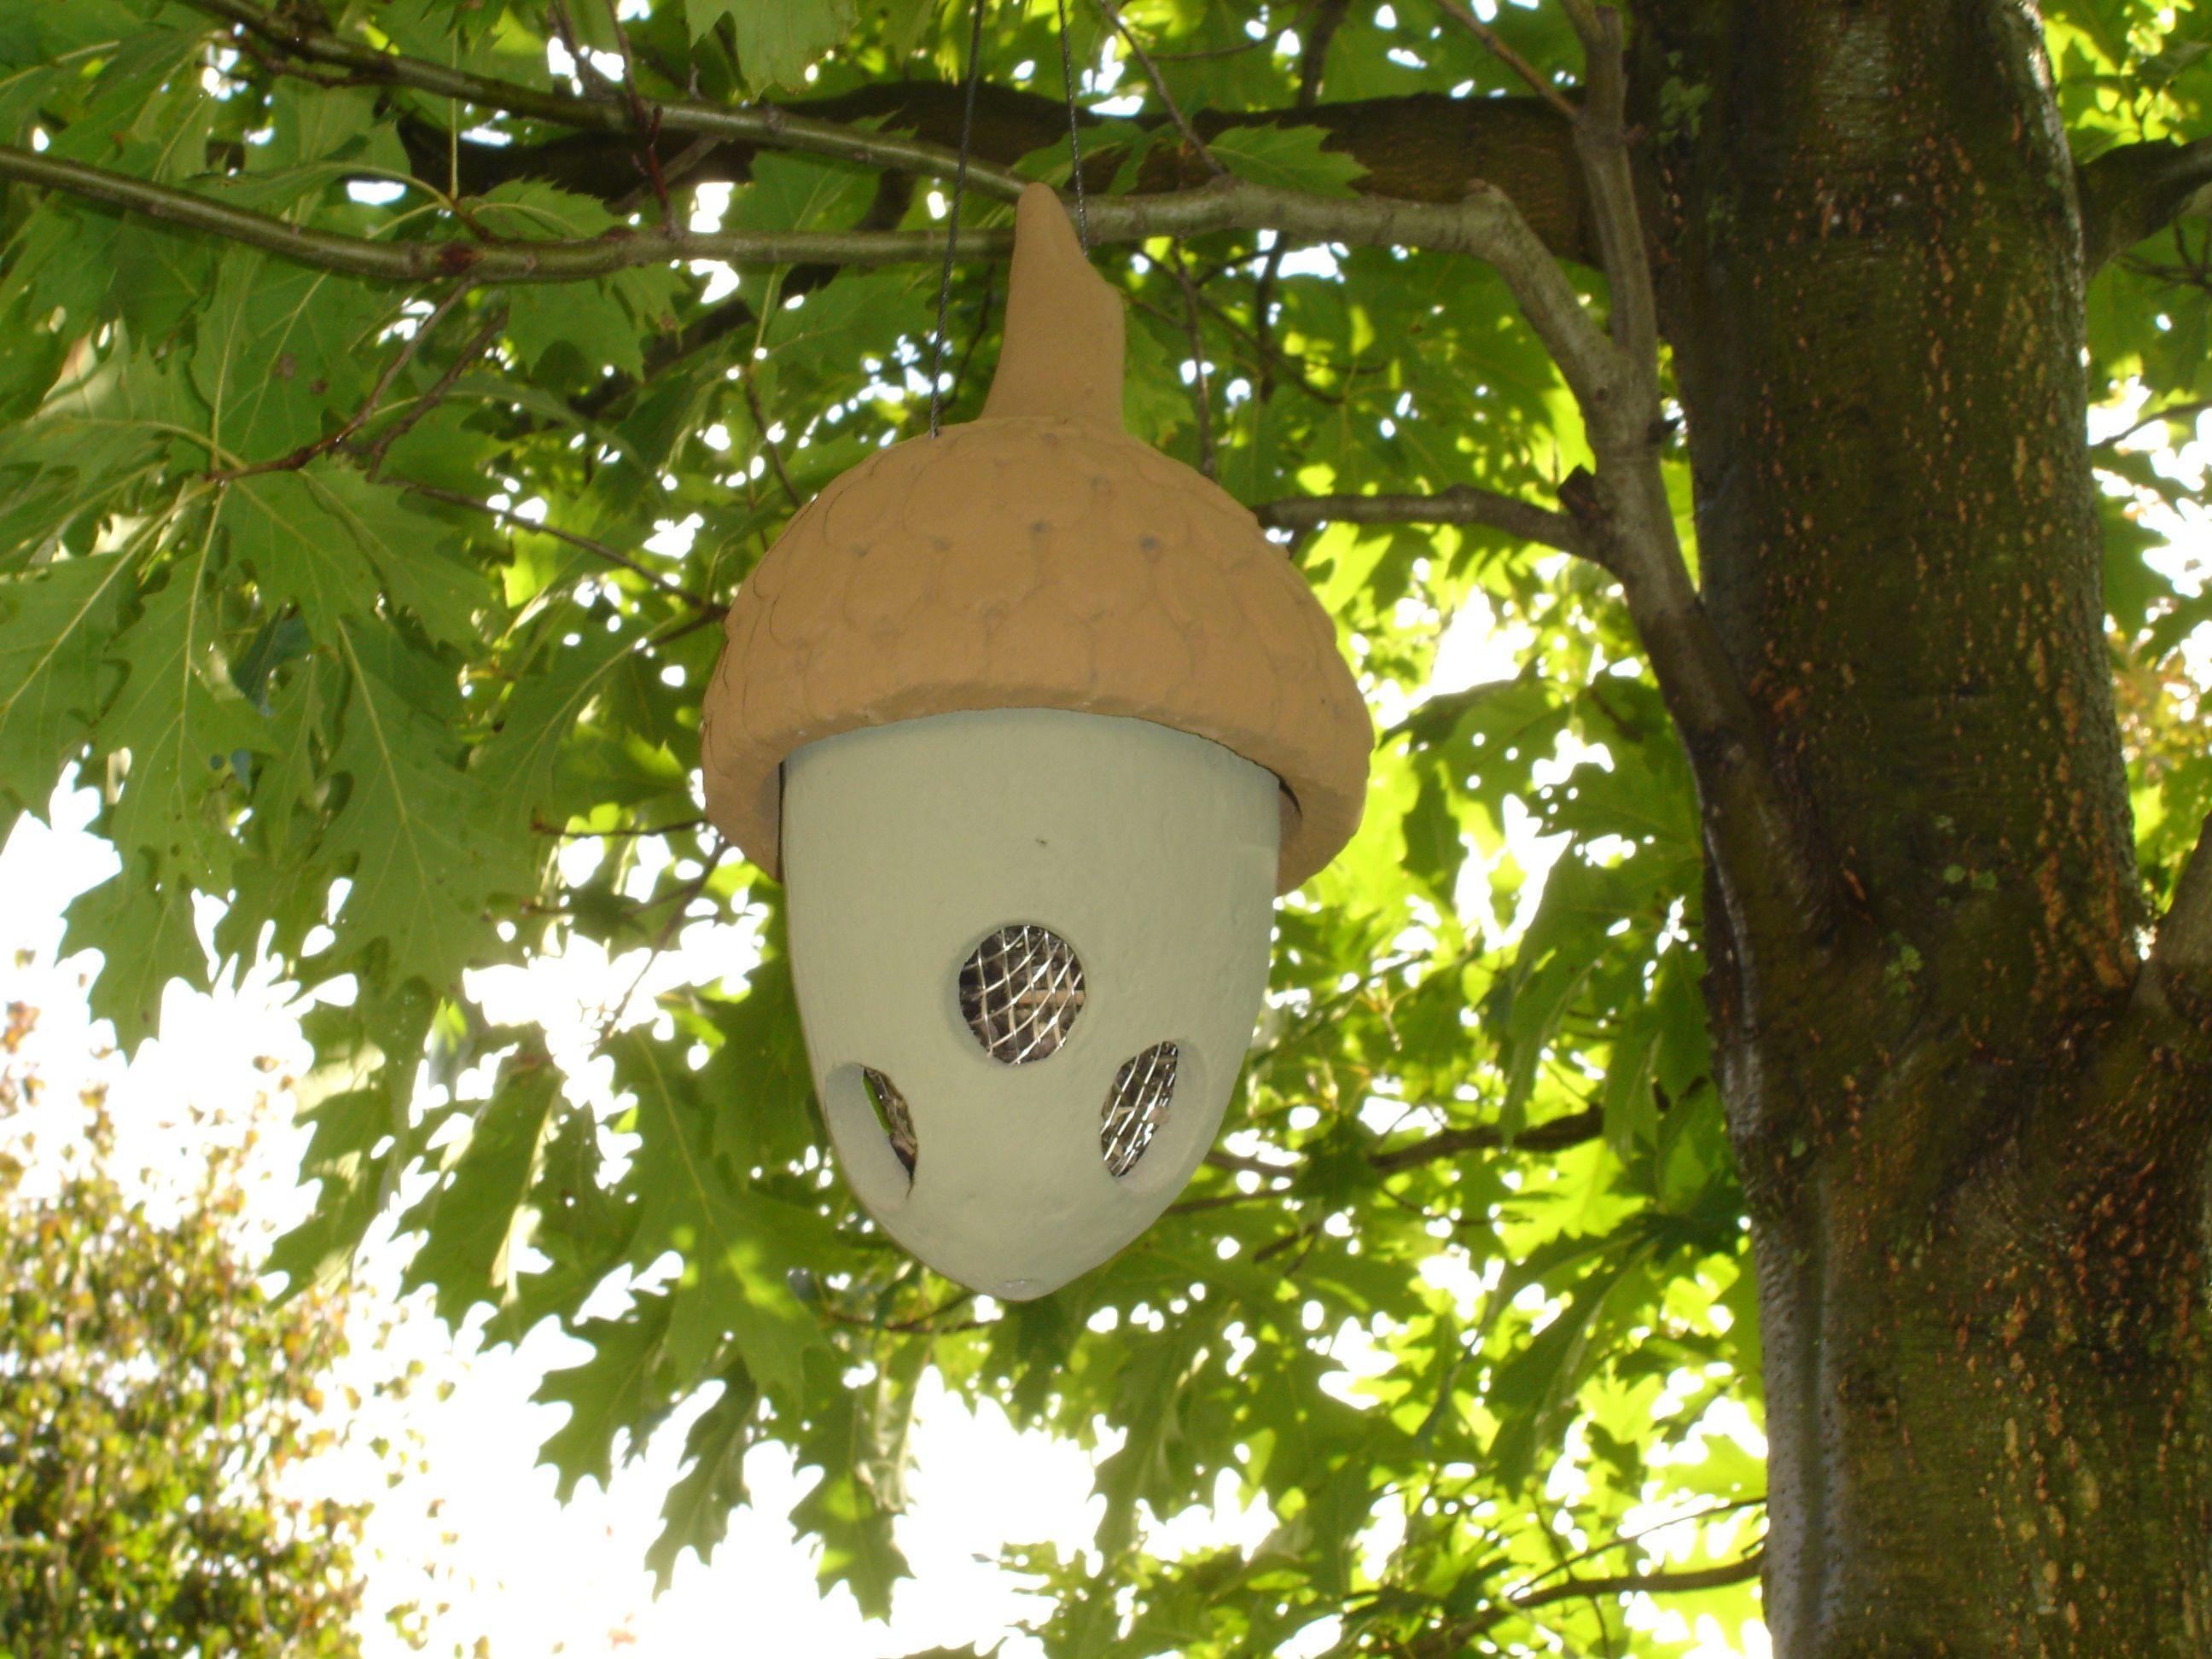 Ceramic acorn bird feeder I picked up at a craft show.